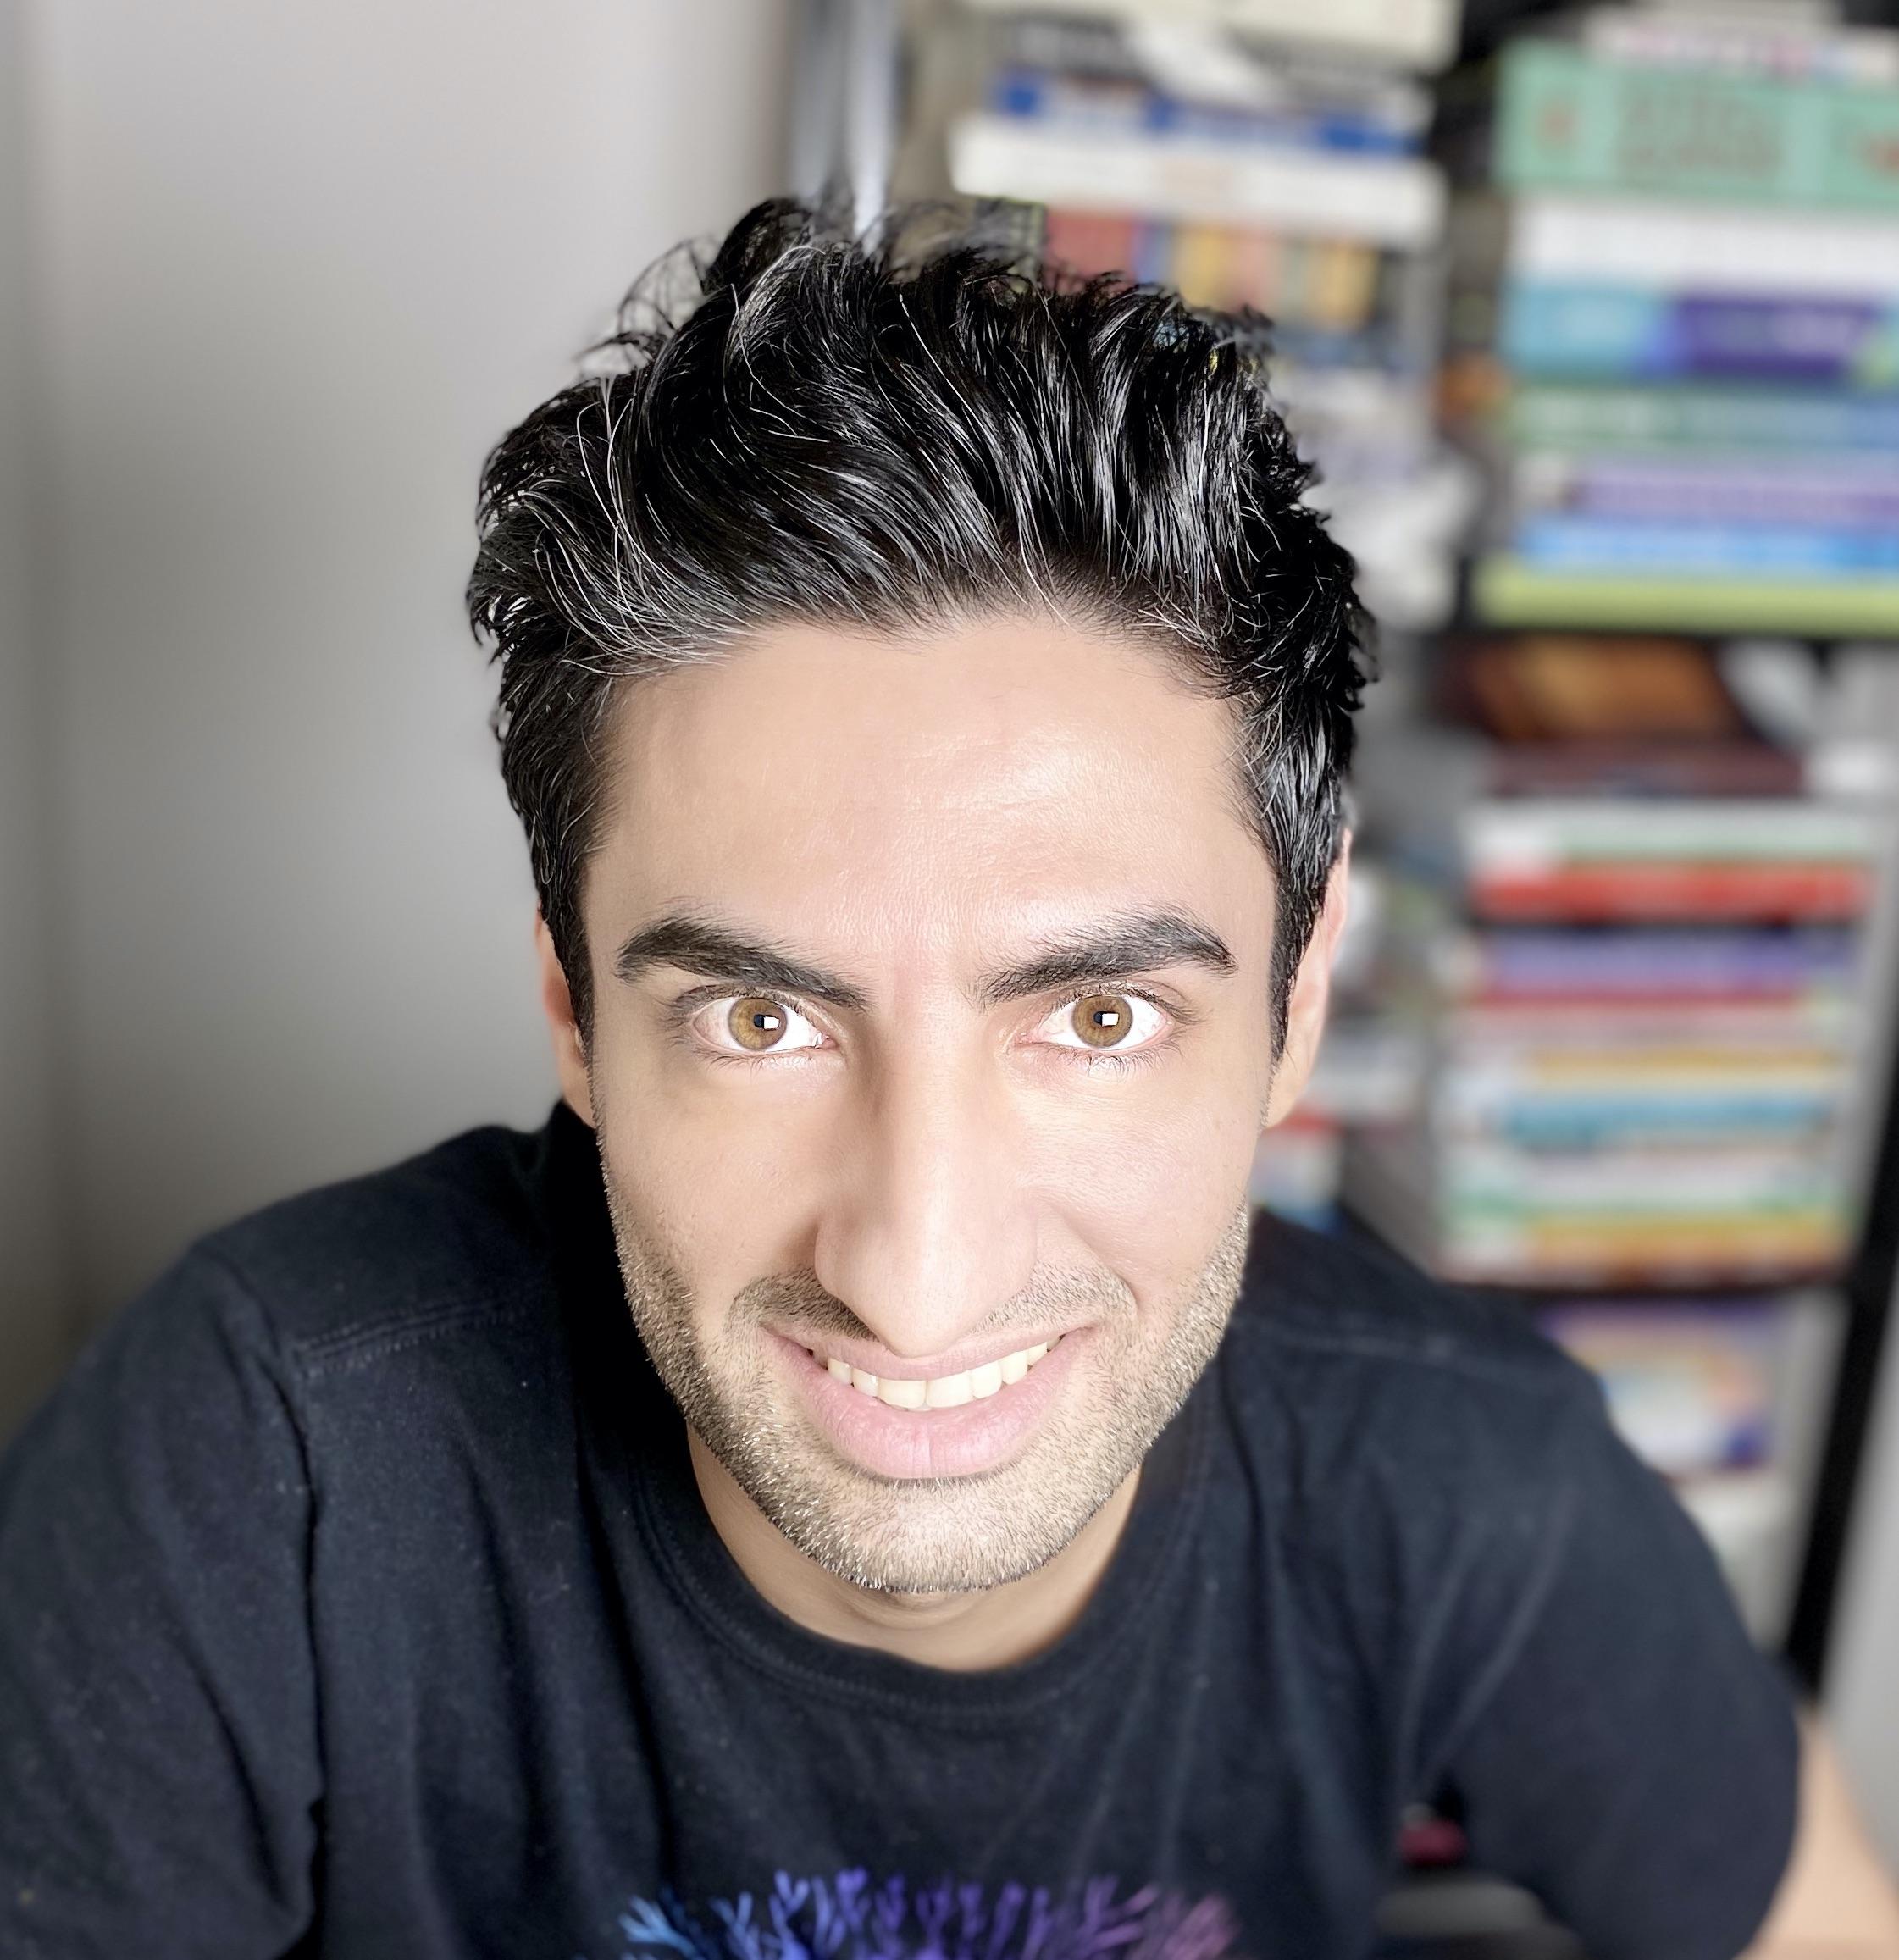 Ardavan Mirhosseini